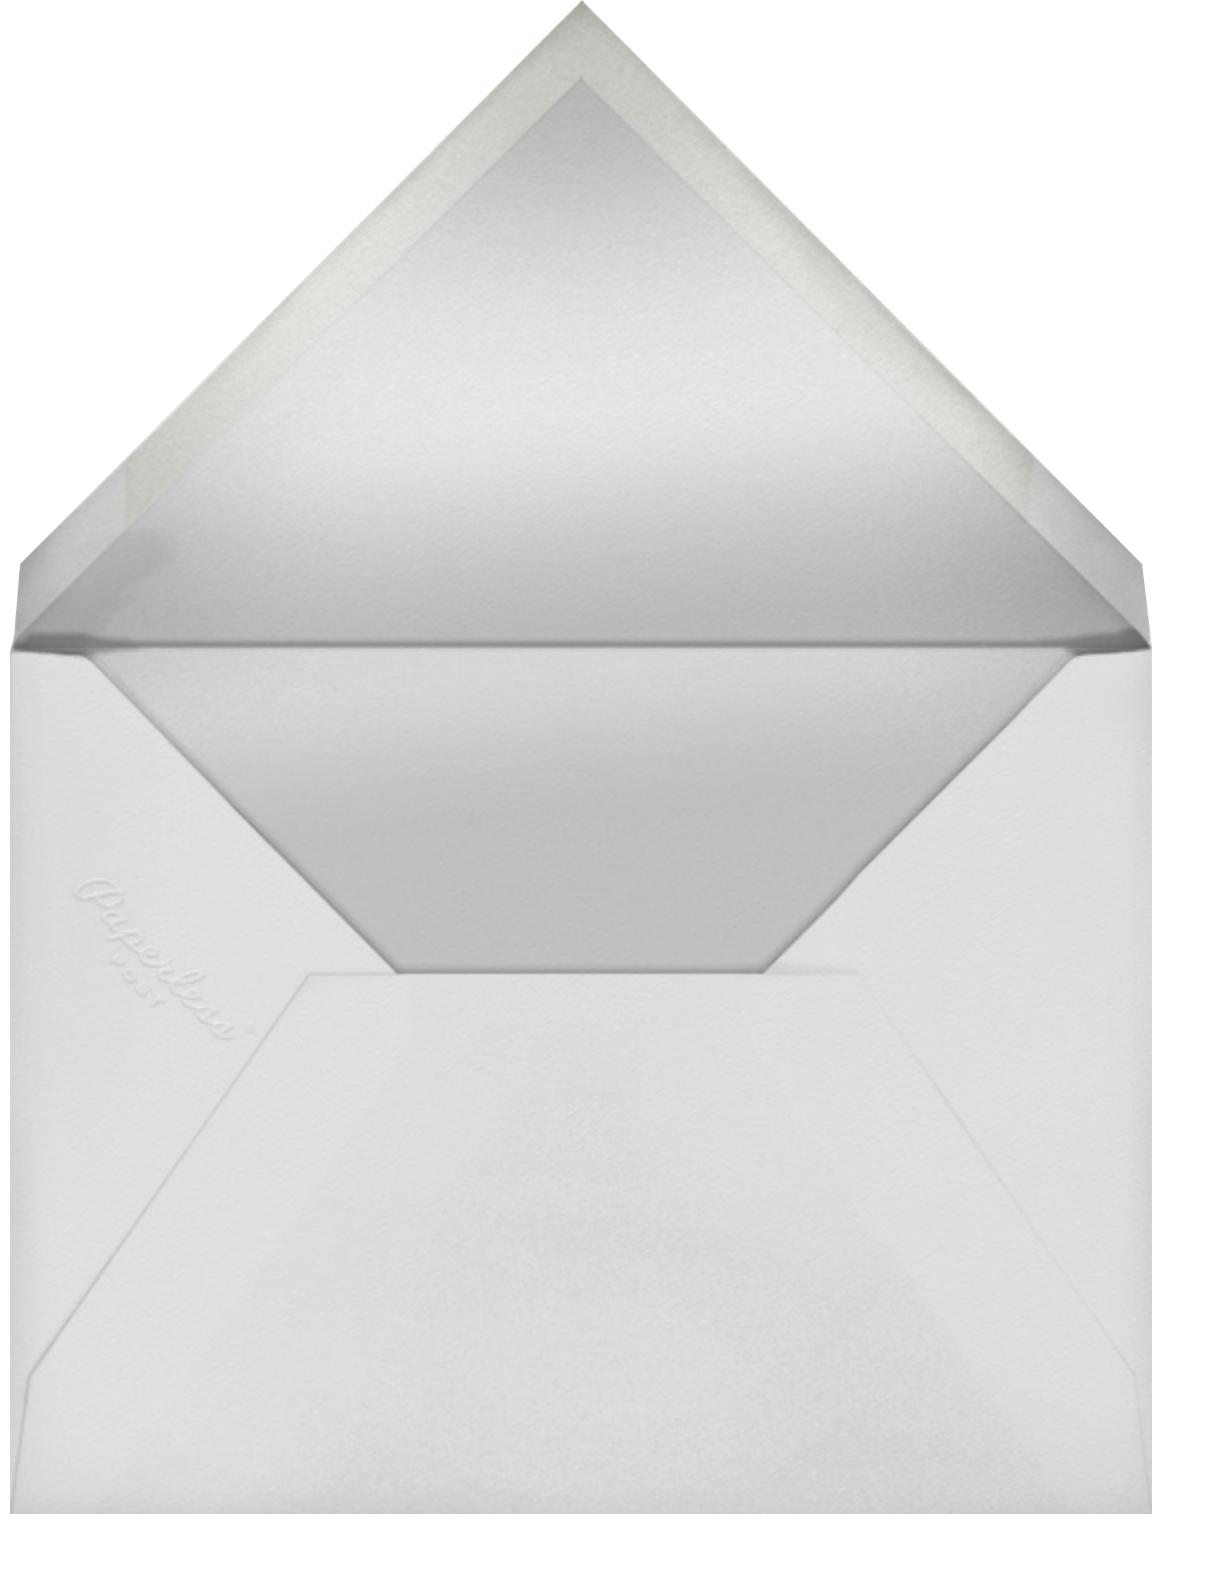 Lodden (Program) - Blue - Liberty - Envelope